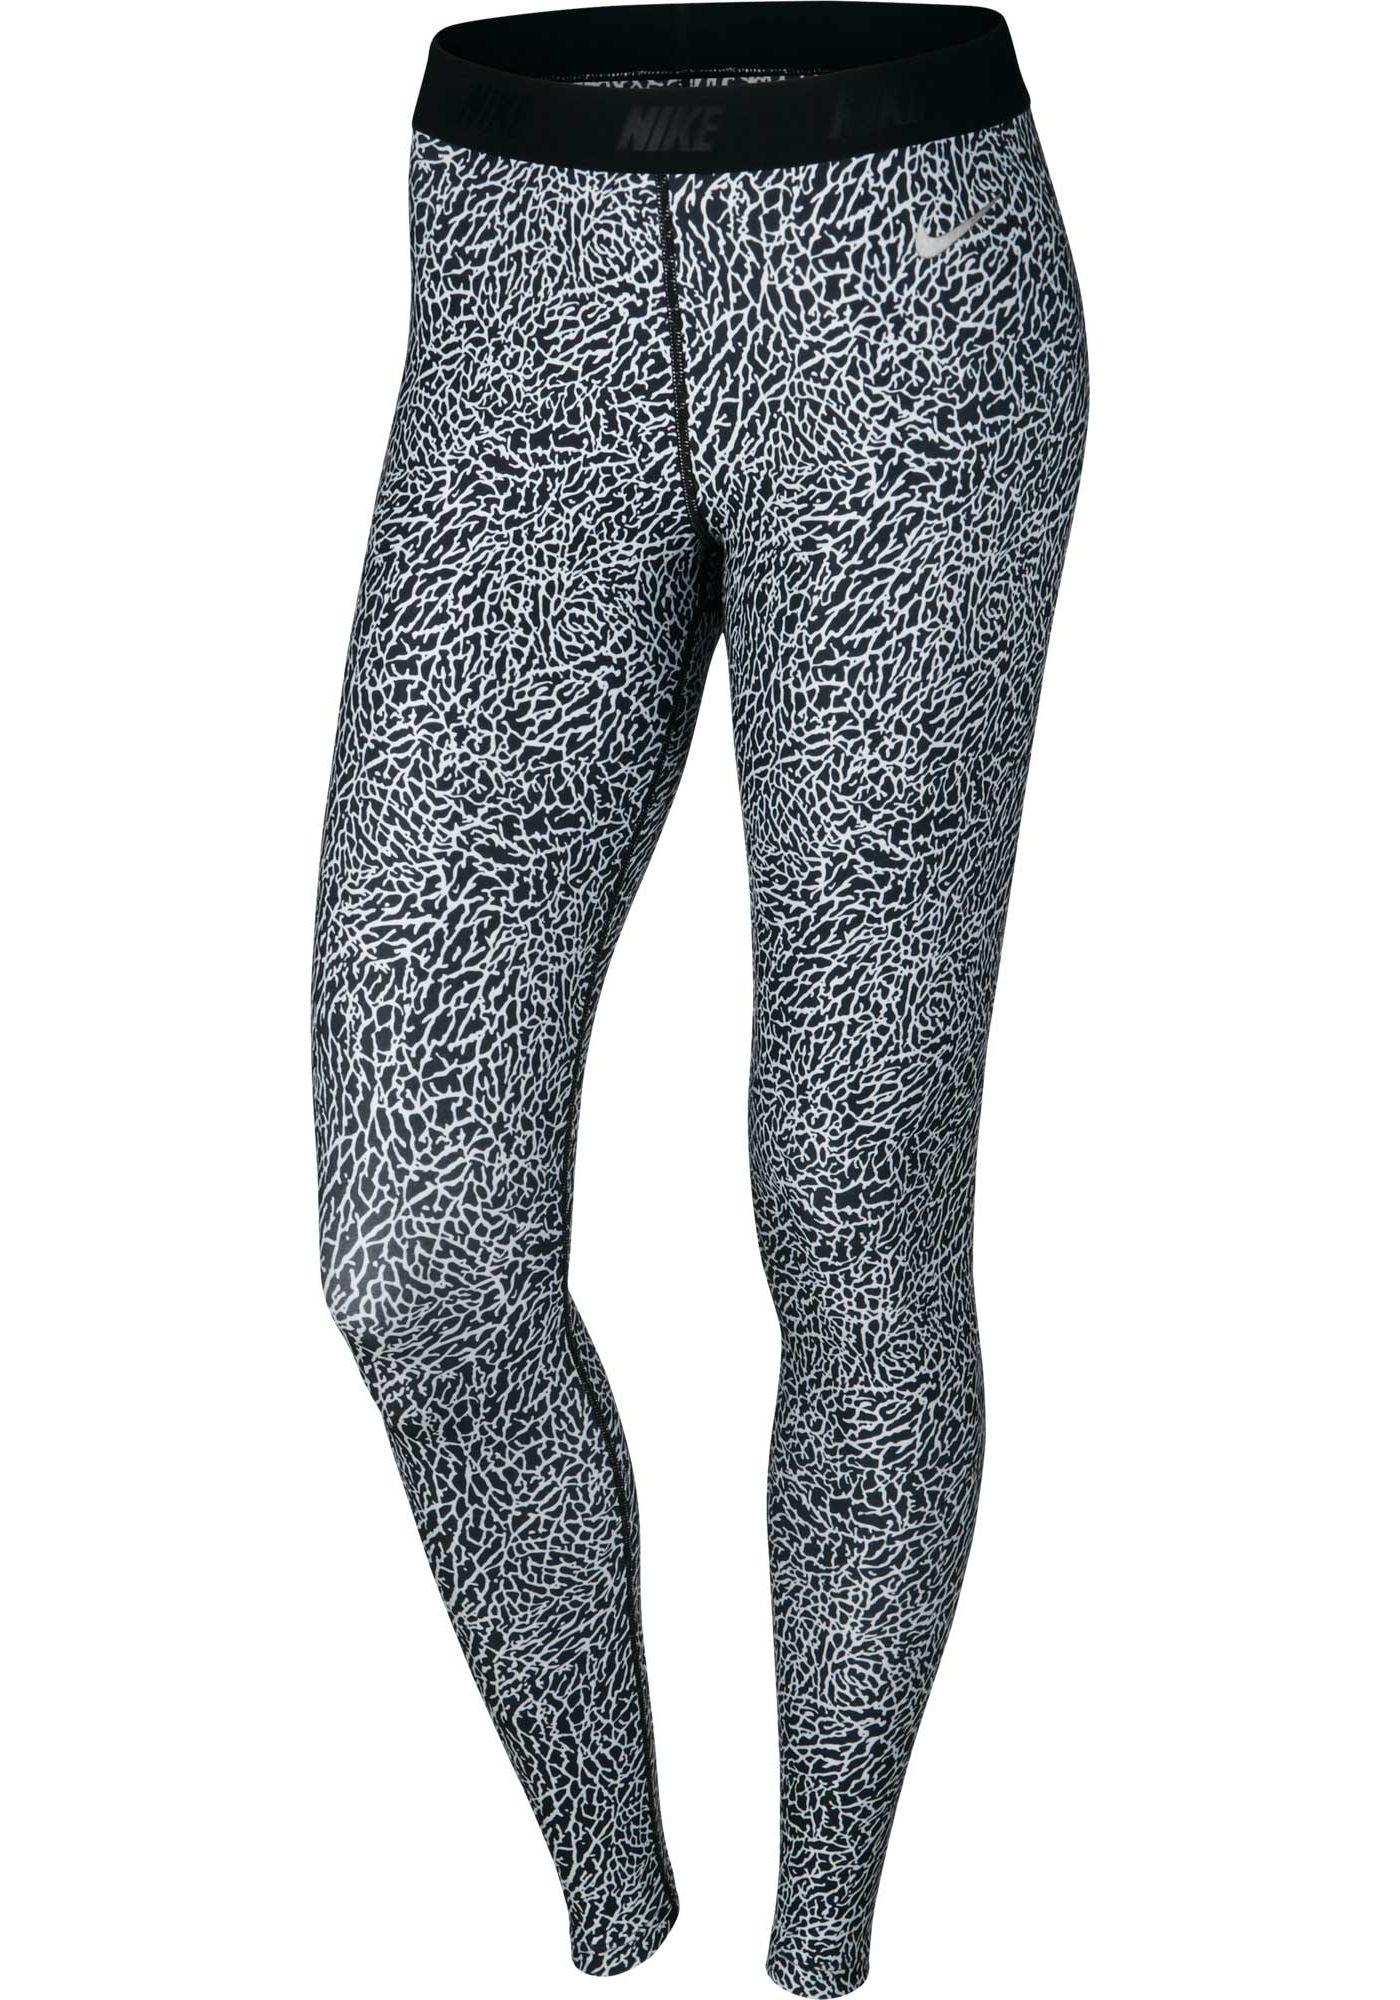 Nike Women's Print Golf Tights